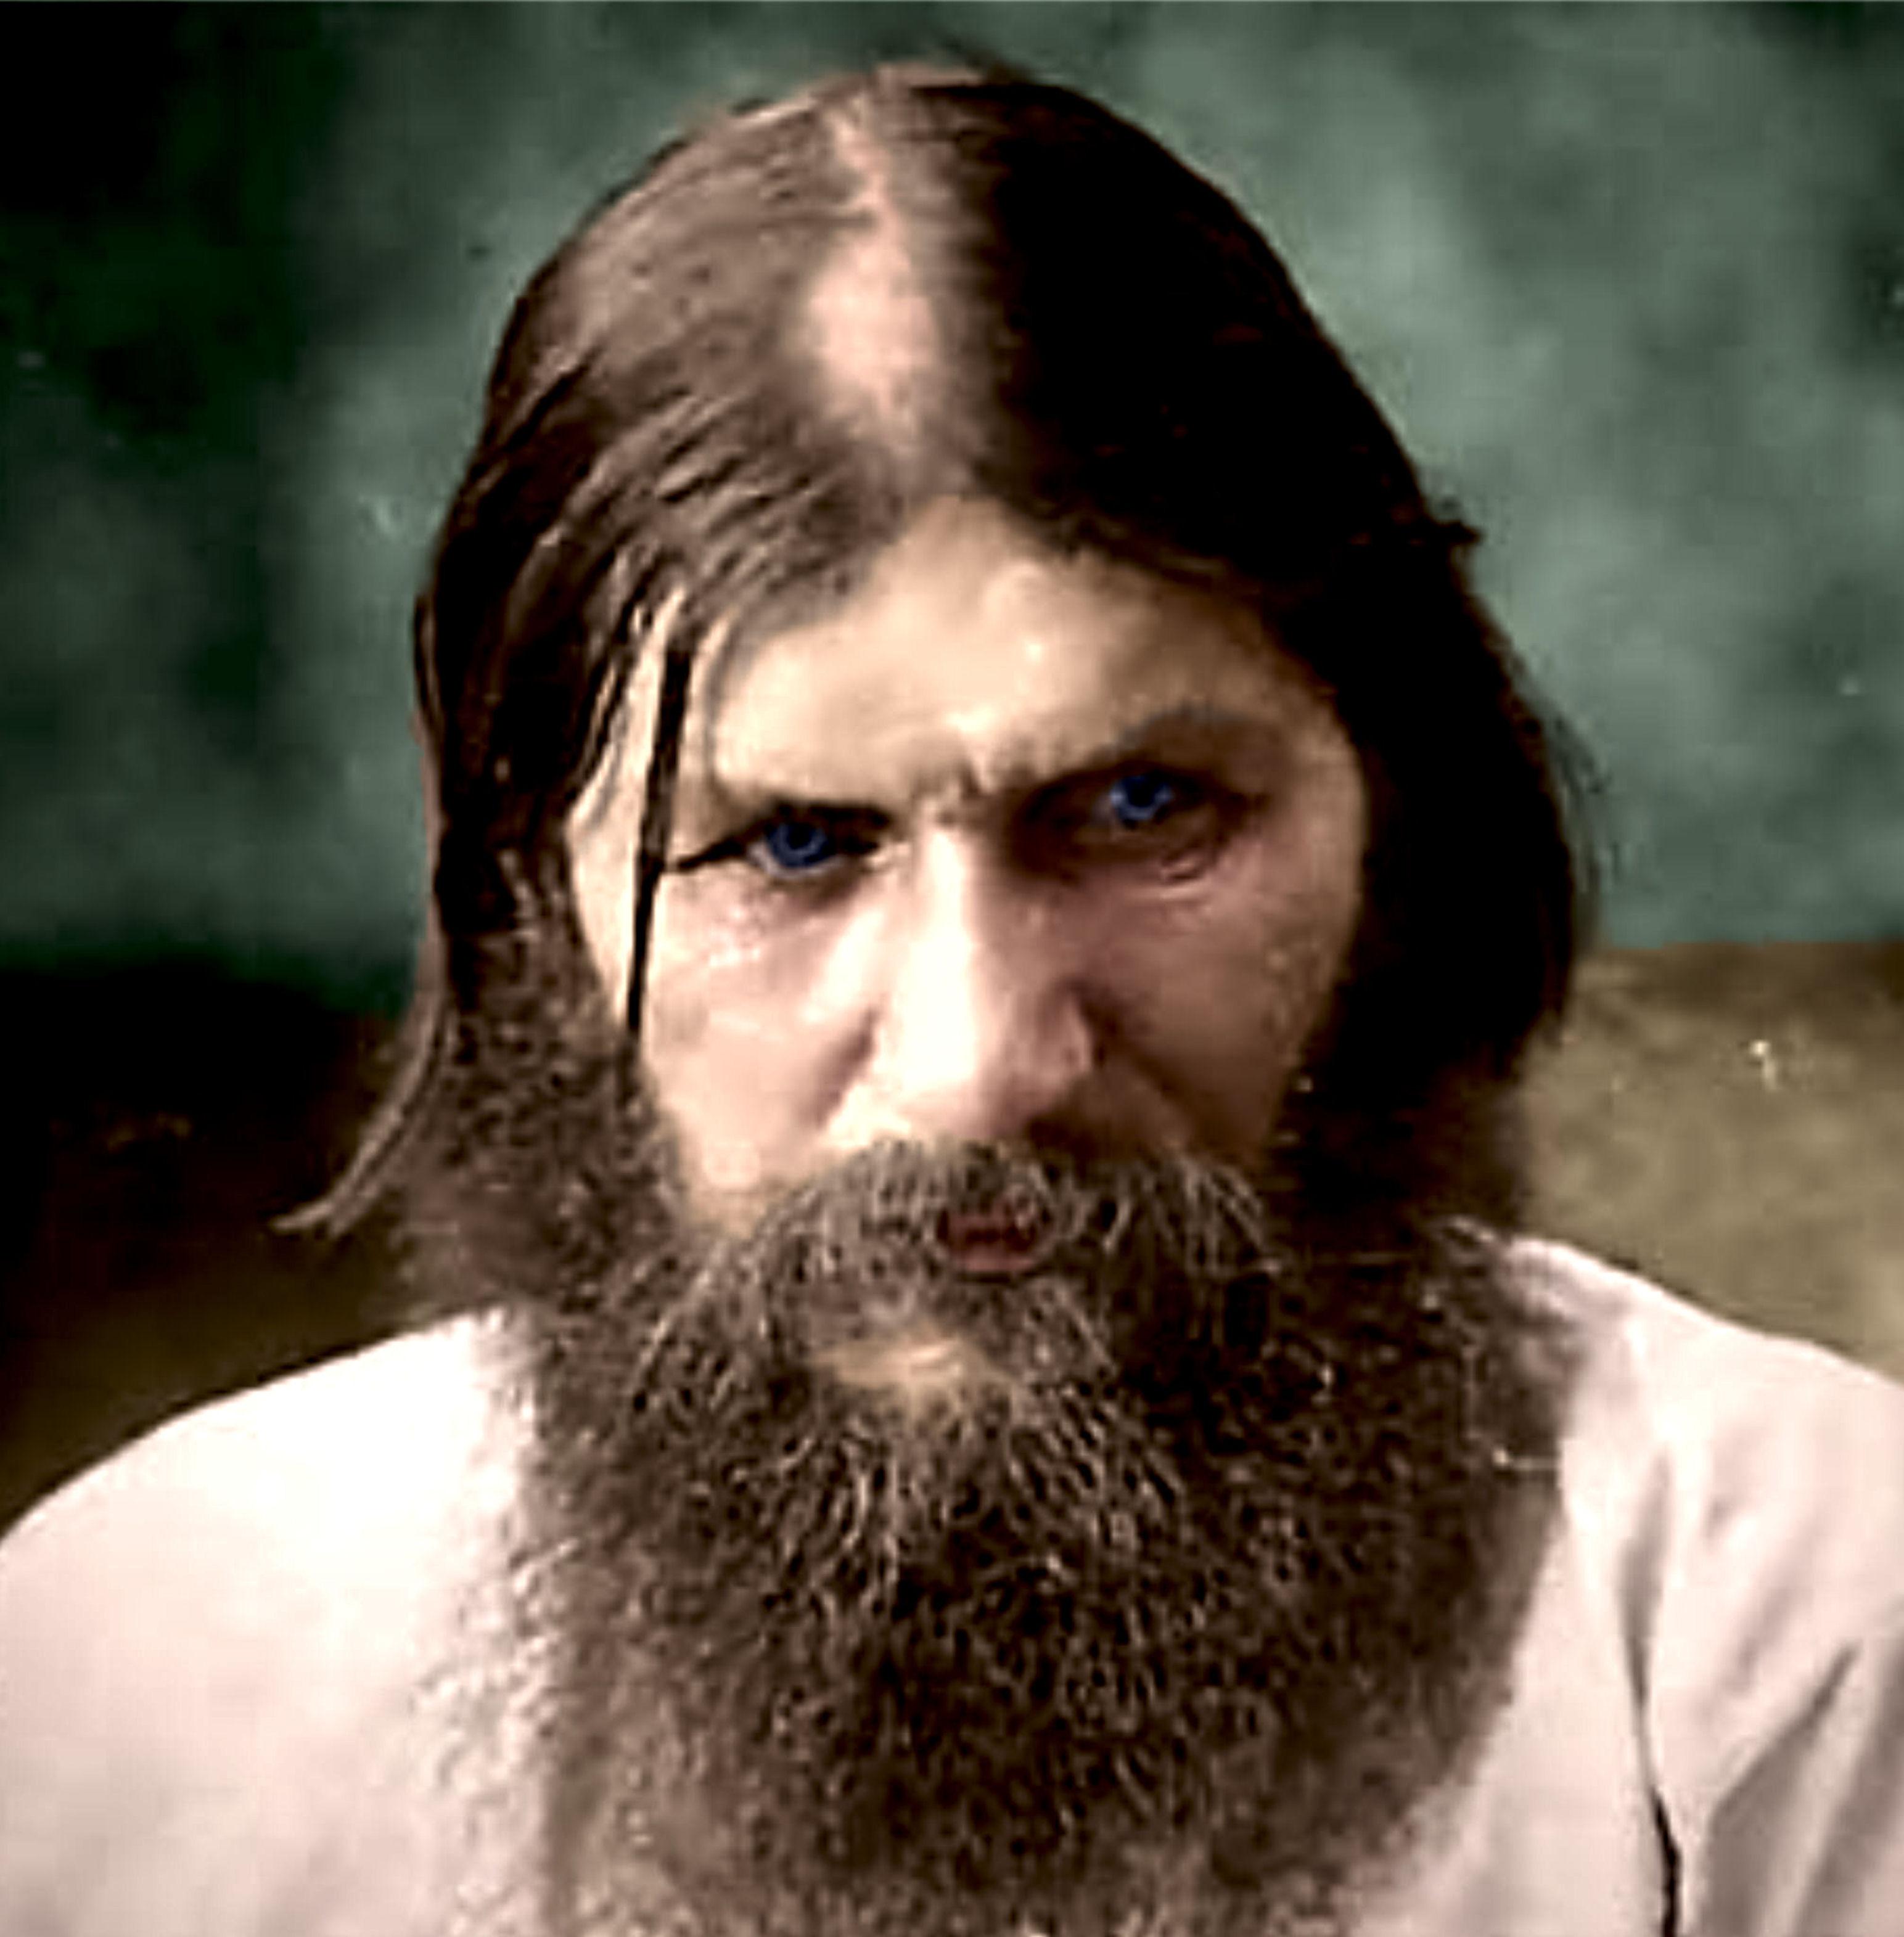 grigori efimovich rasputin date unknown but probably about 1915